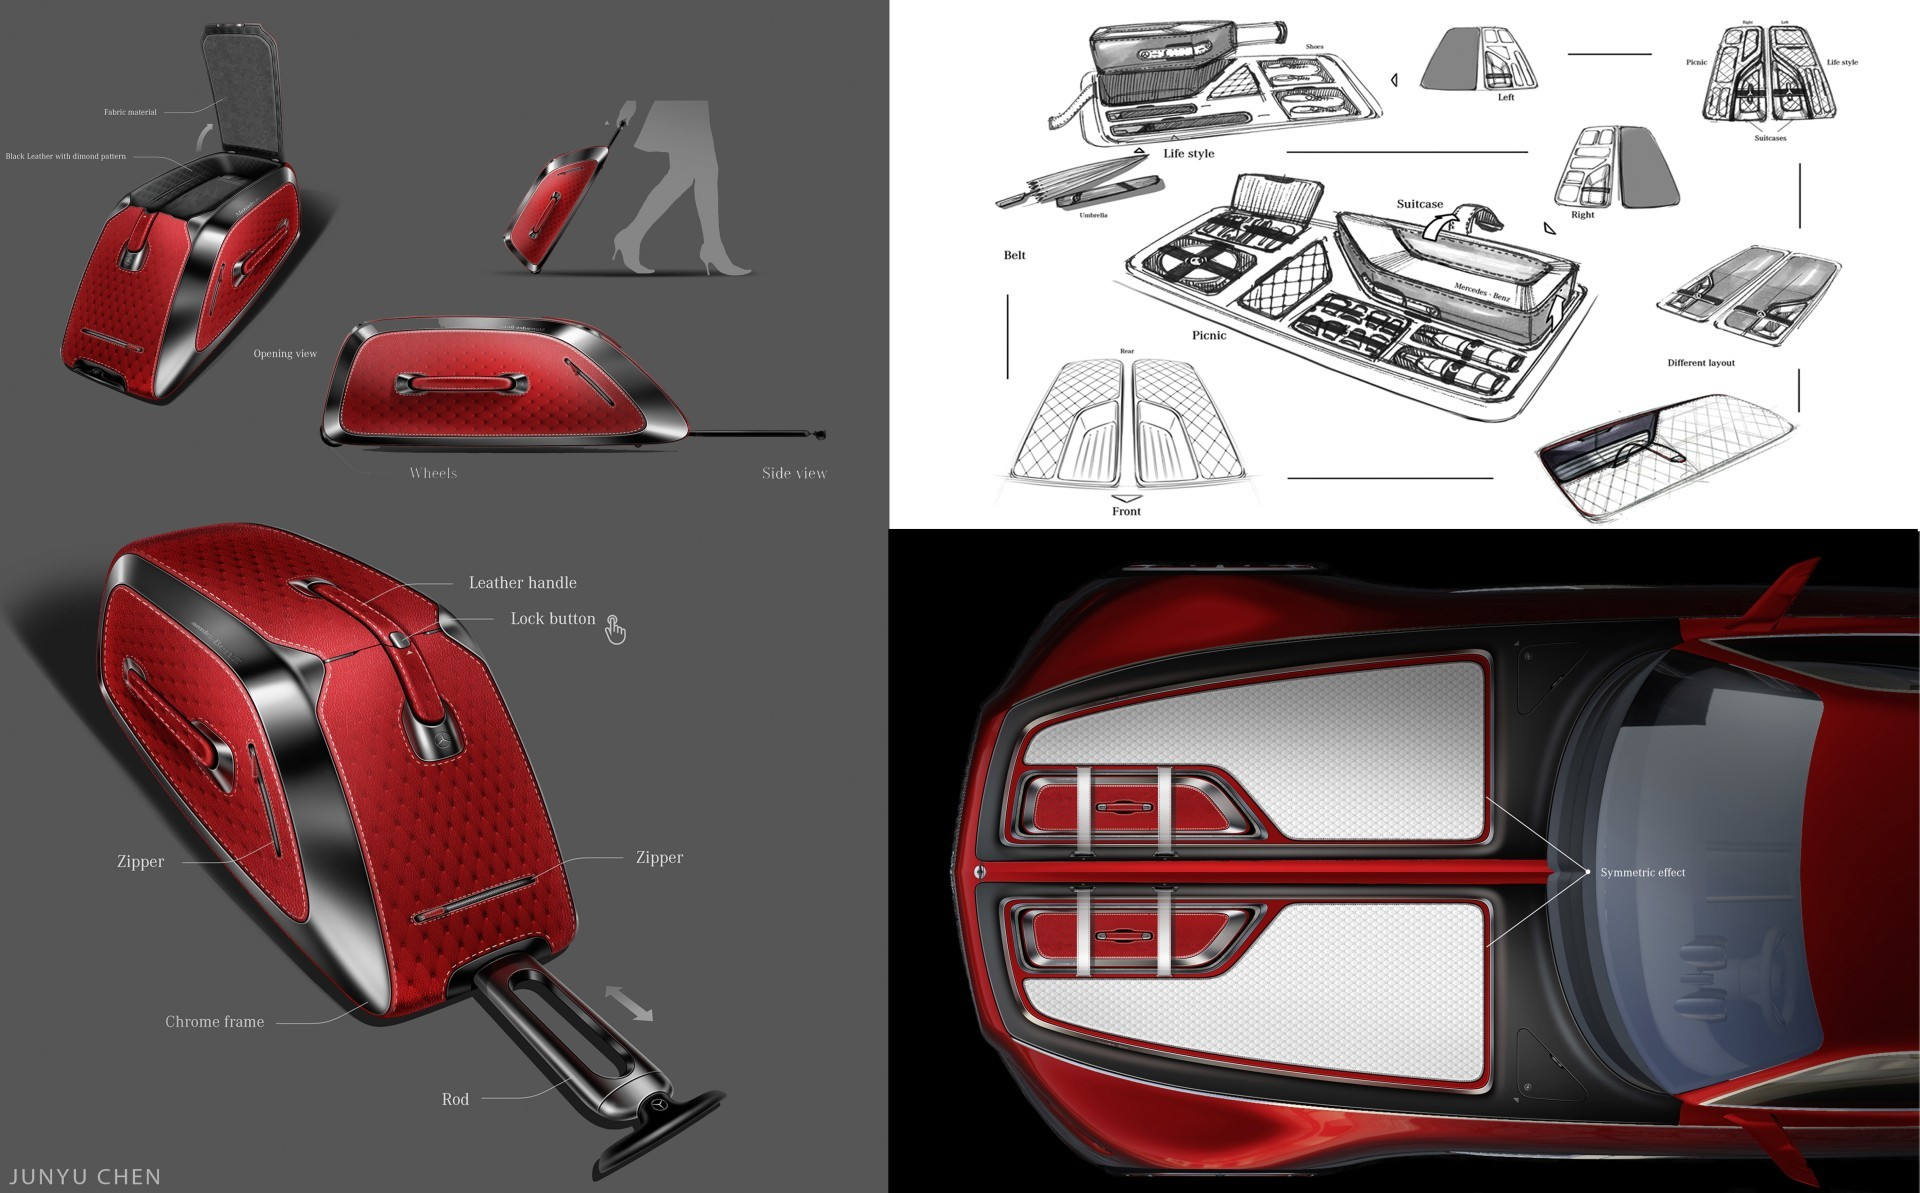 Проект шестиметрового электрокара Vision Mercedes-Maybach 6 - 9